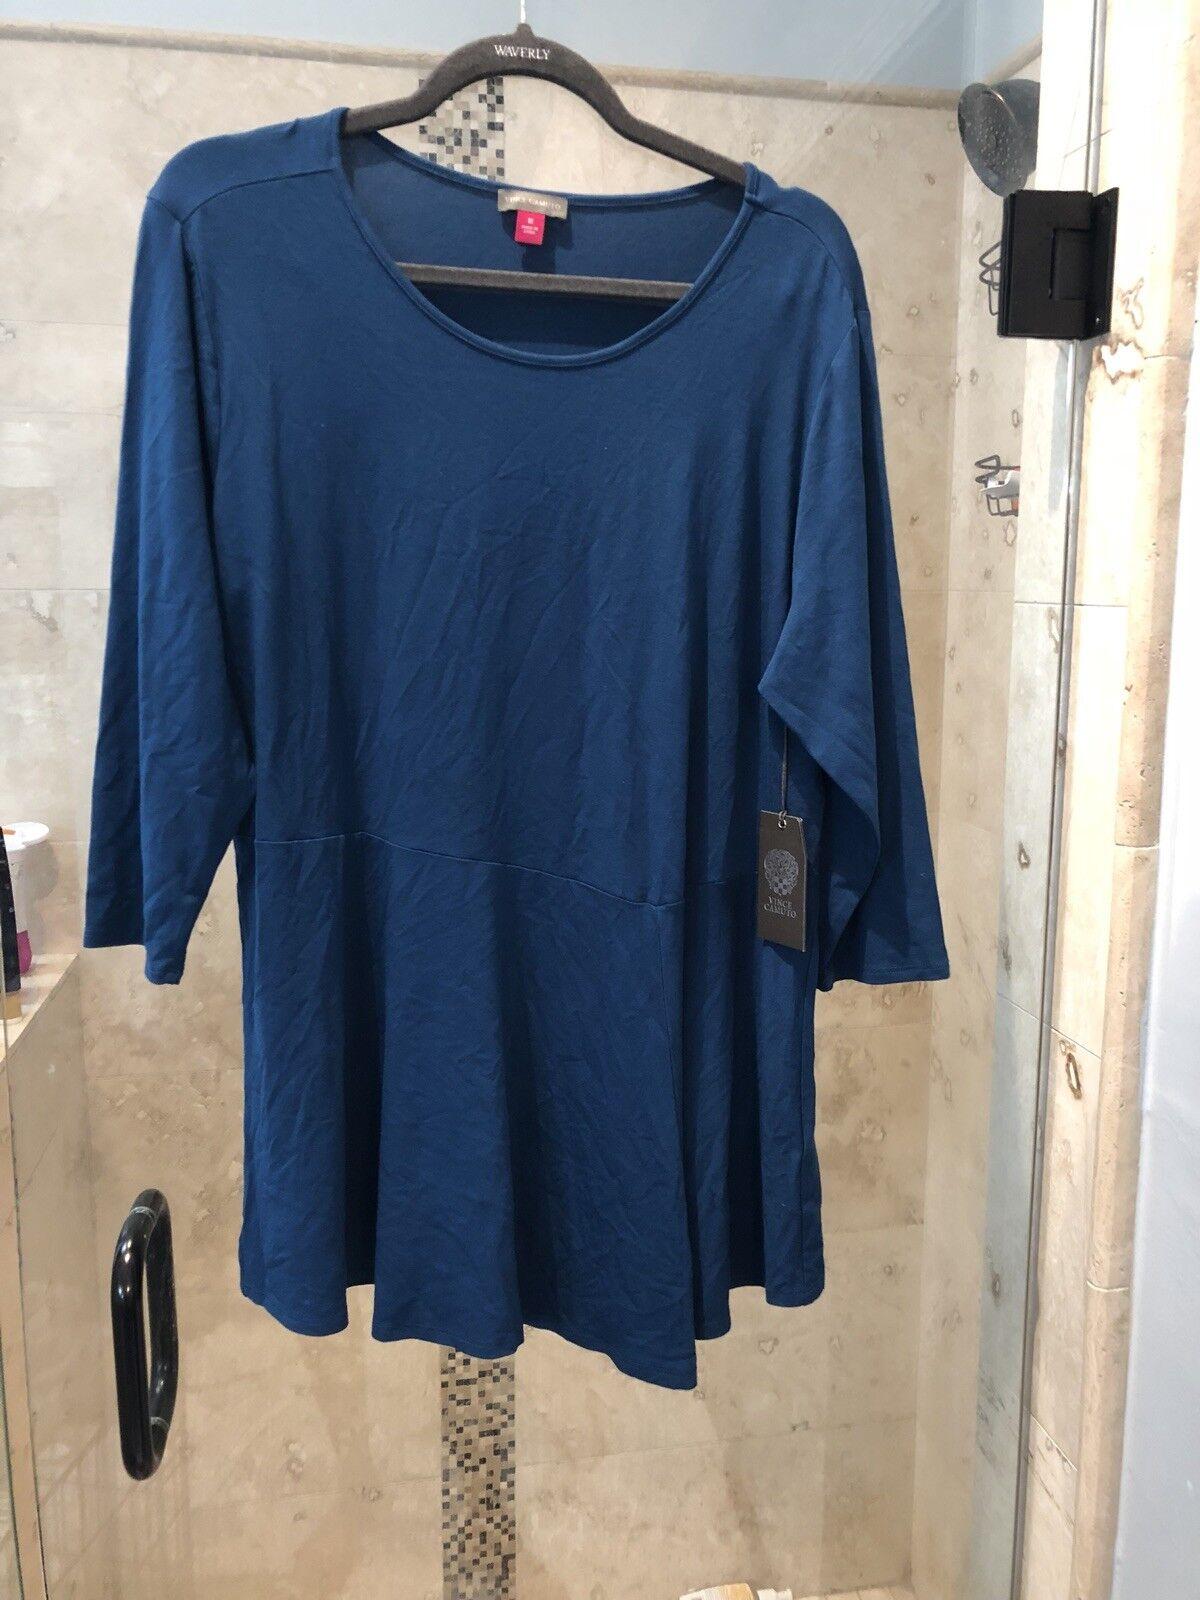 NWT  VINCE CAMUTO Plus Größe 1x Blau  T-Shirt Top Blouse Woherren